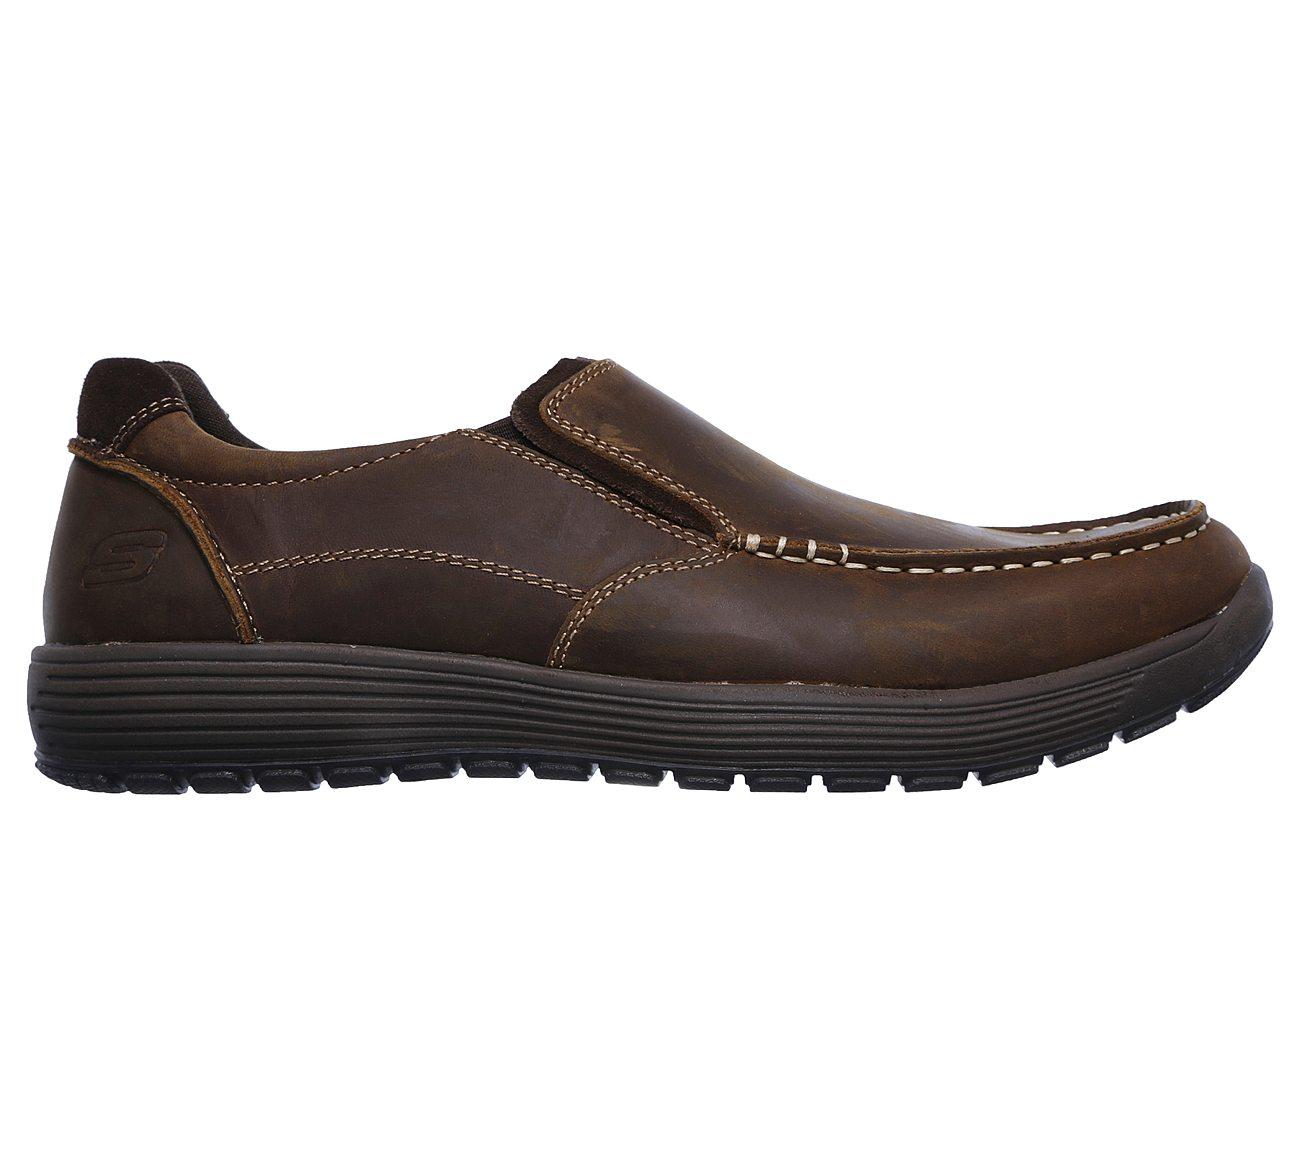 Perlo SKECHERS Skech-Air Shoes